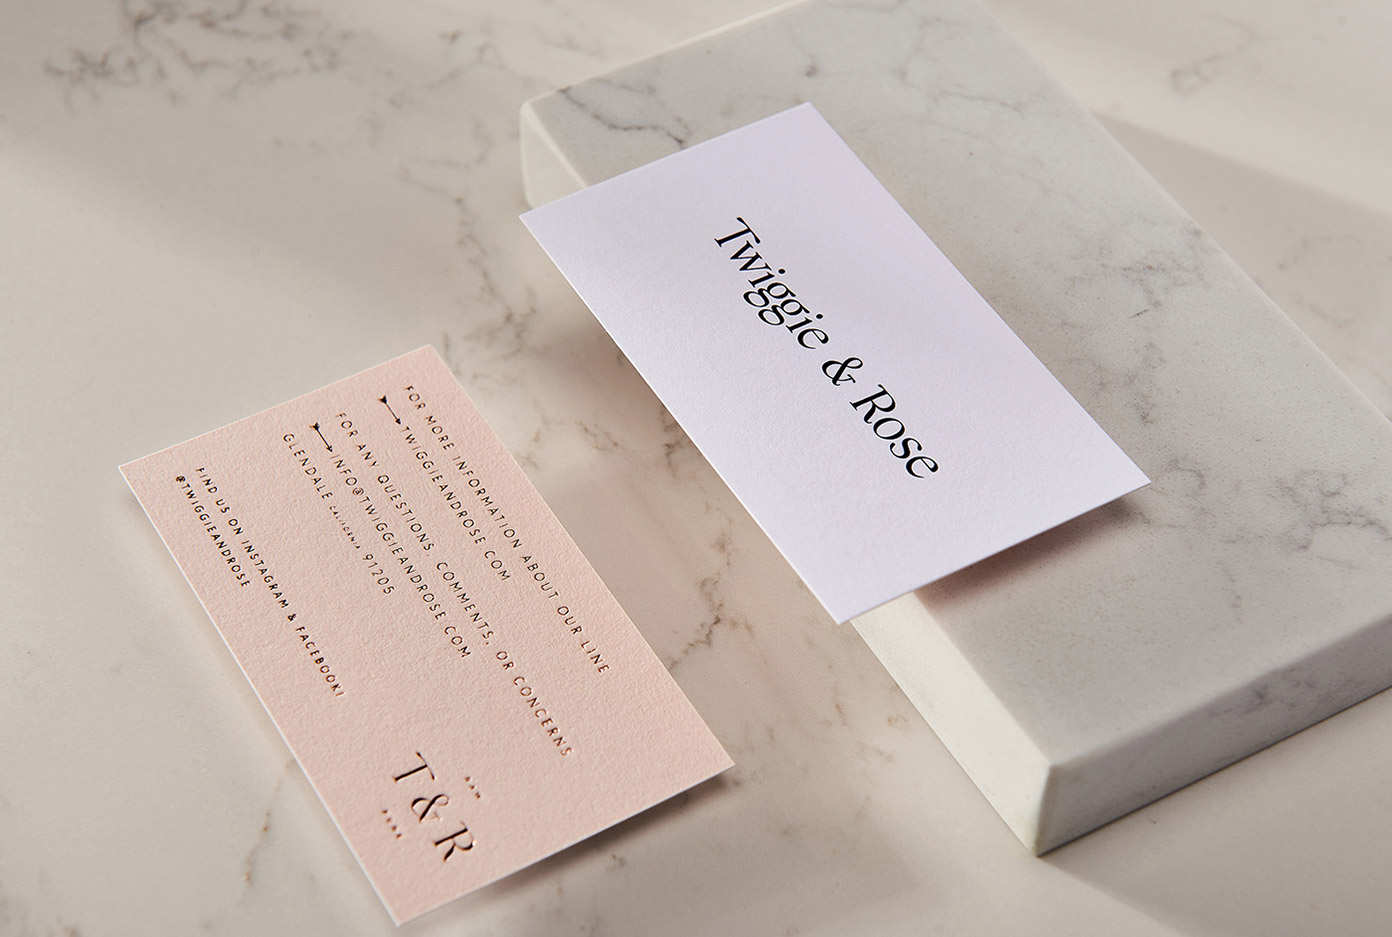 Twiggie & Rose skincare branding by Menta